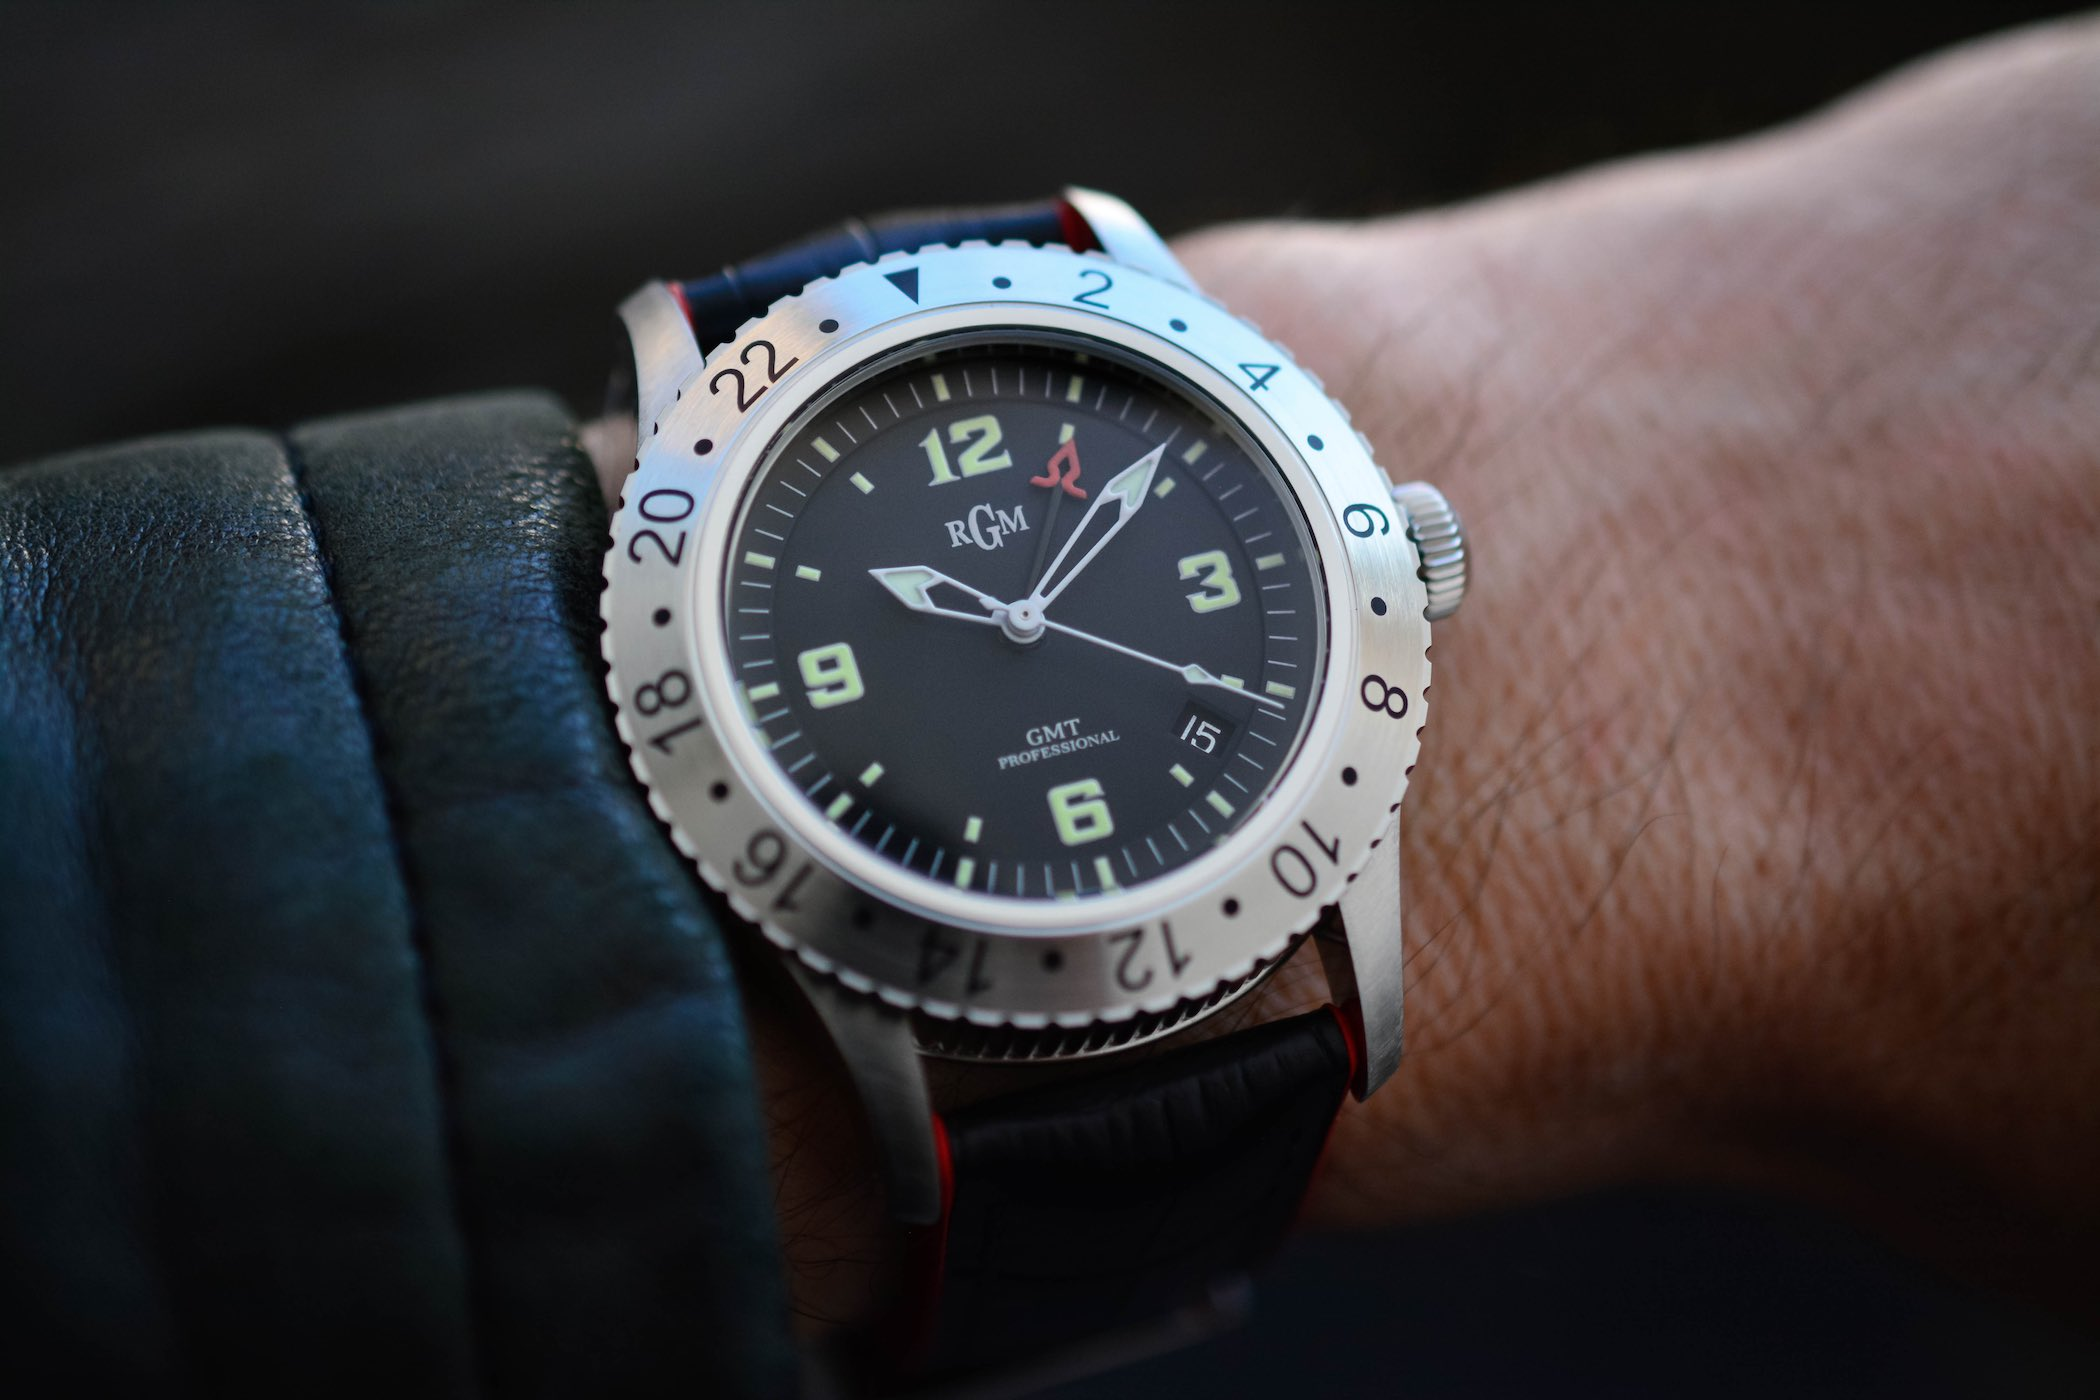 RGM Model 500-GMT